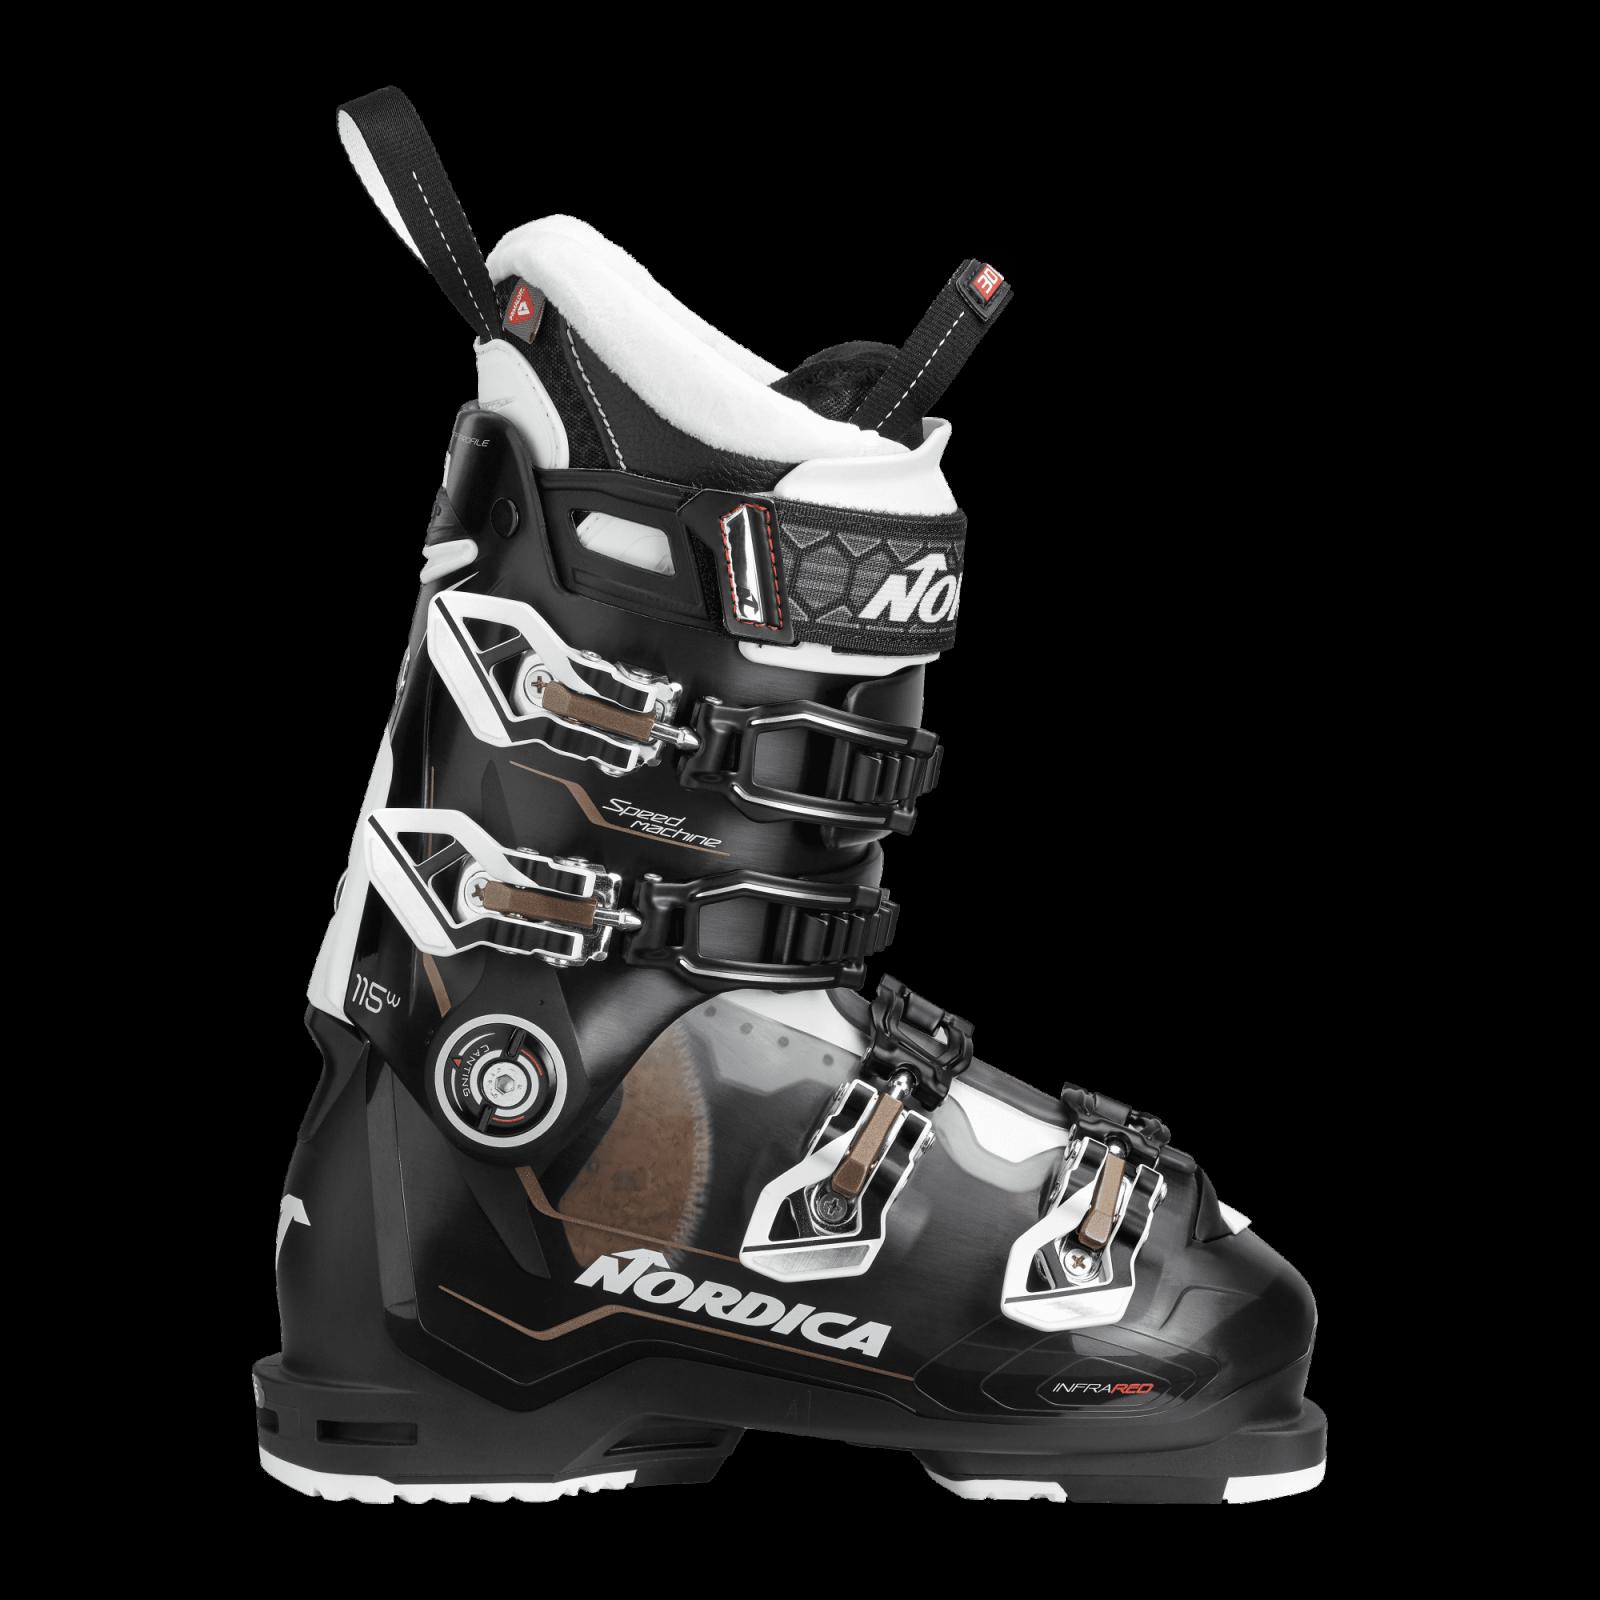 Nordica Speedmachine 115 W Ski Boots 2019